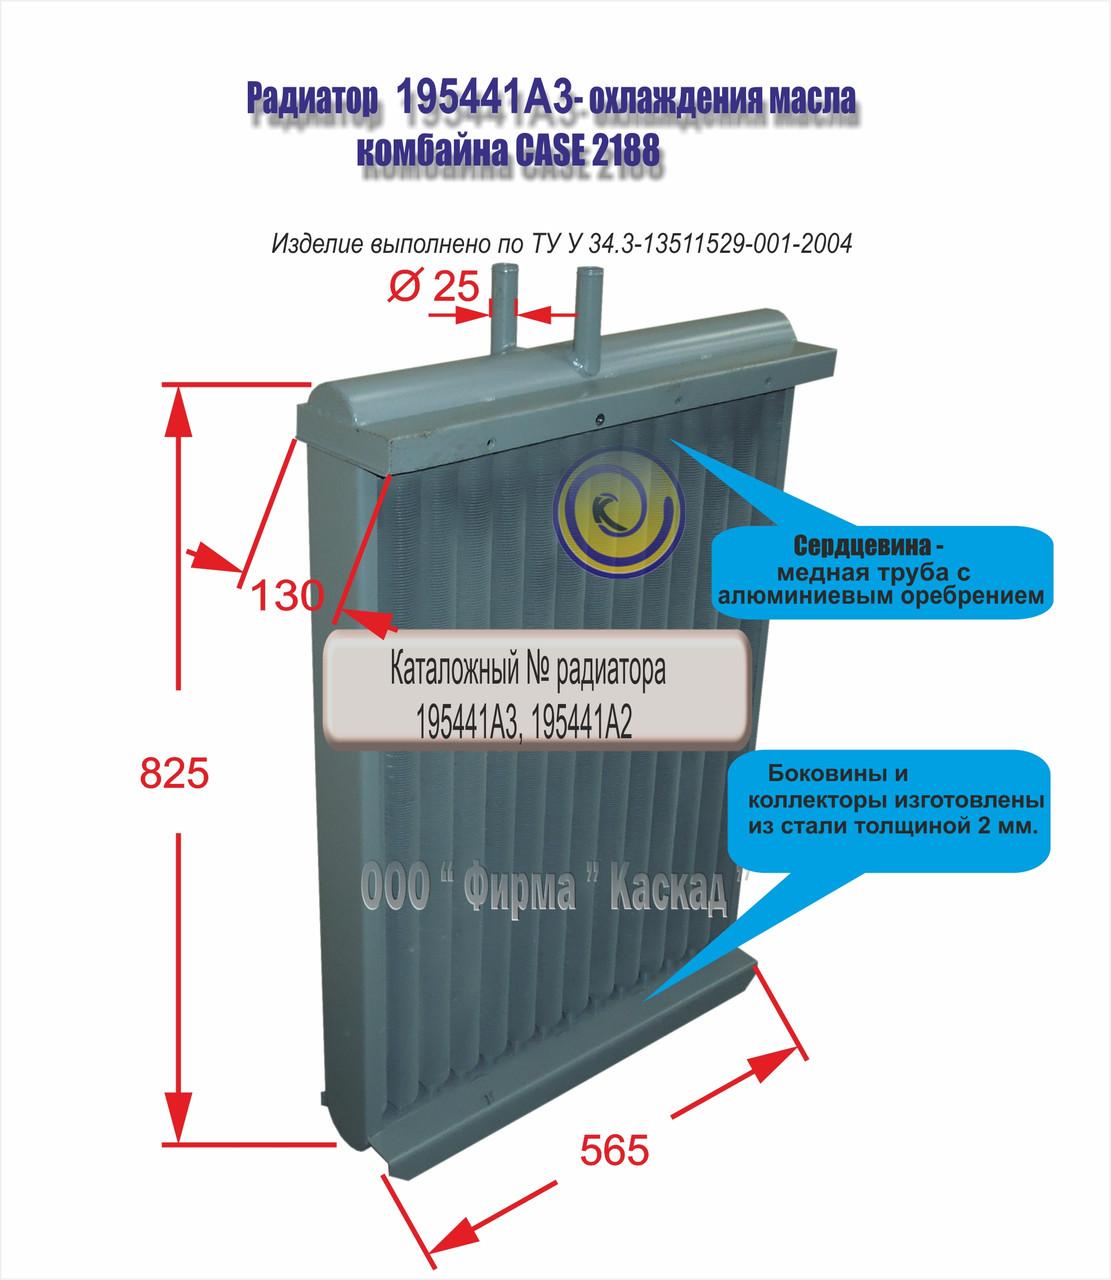 Радиатор масляный комбайна  CASE 2188